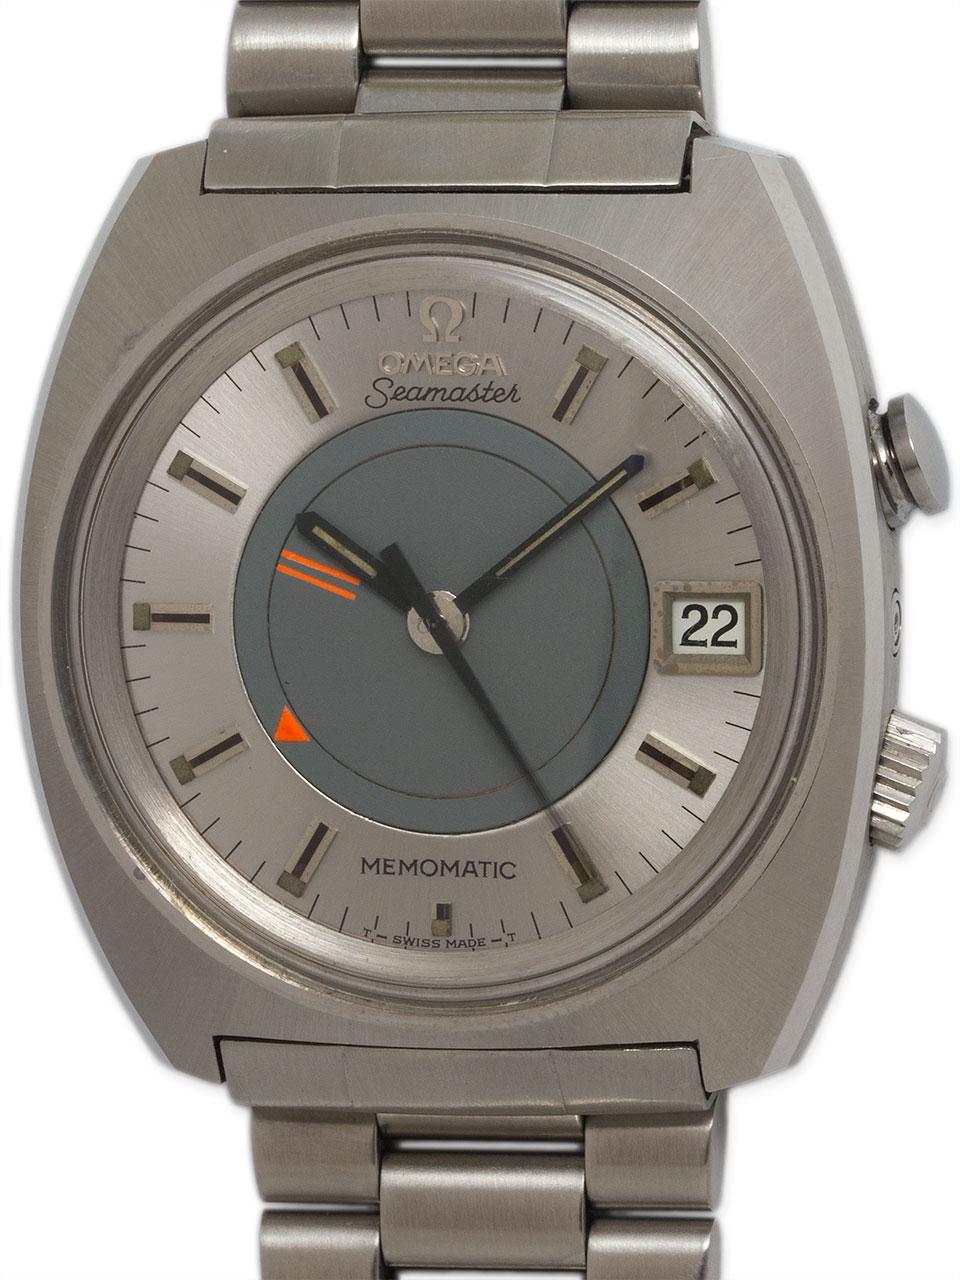 Omega Seamaster Memomatic Alarm circa 1970s